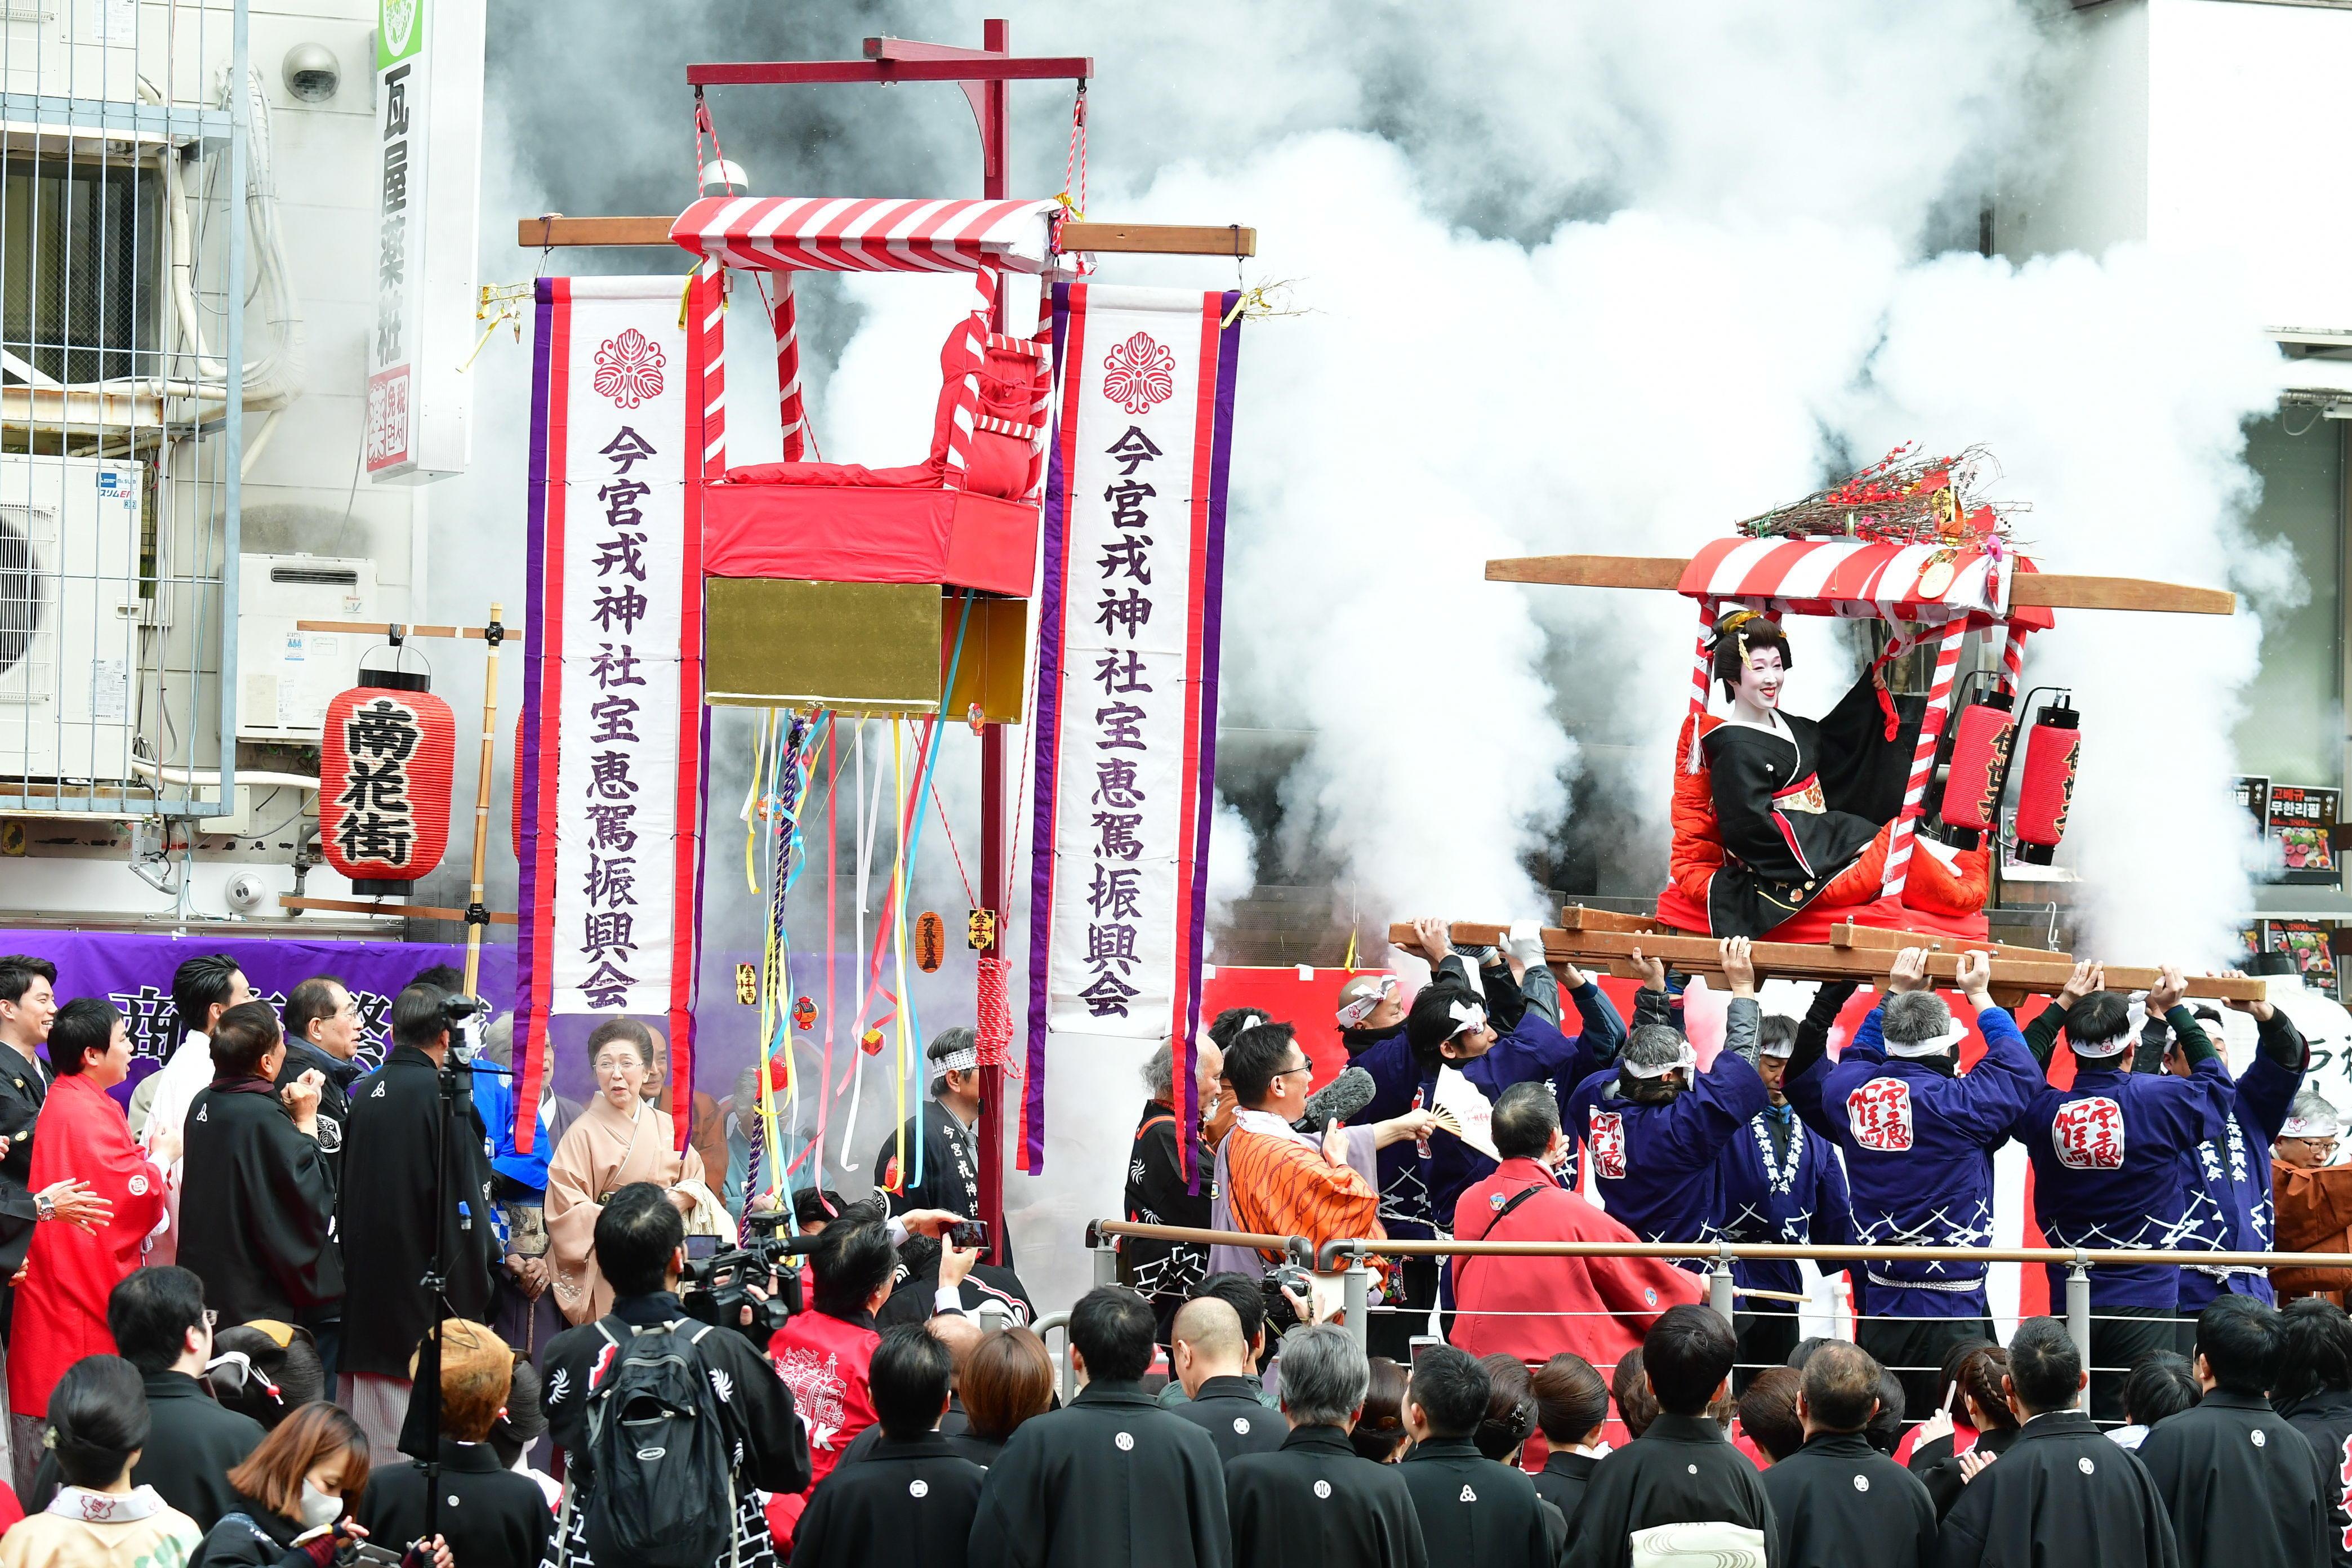 http://news.yoshimoto.co.jp/20190110195121-79bb49024ad34b4ab419f8065c73d40471ce2764.jpg